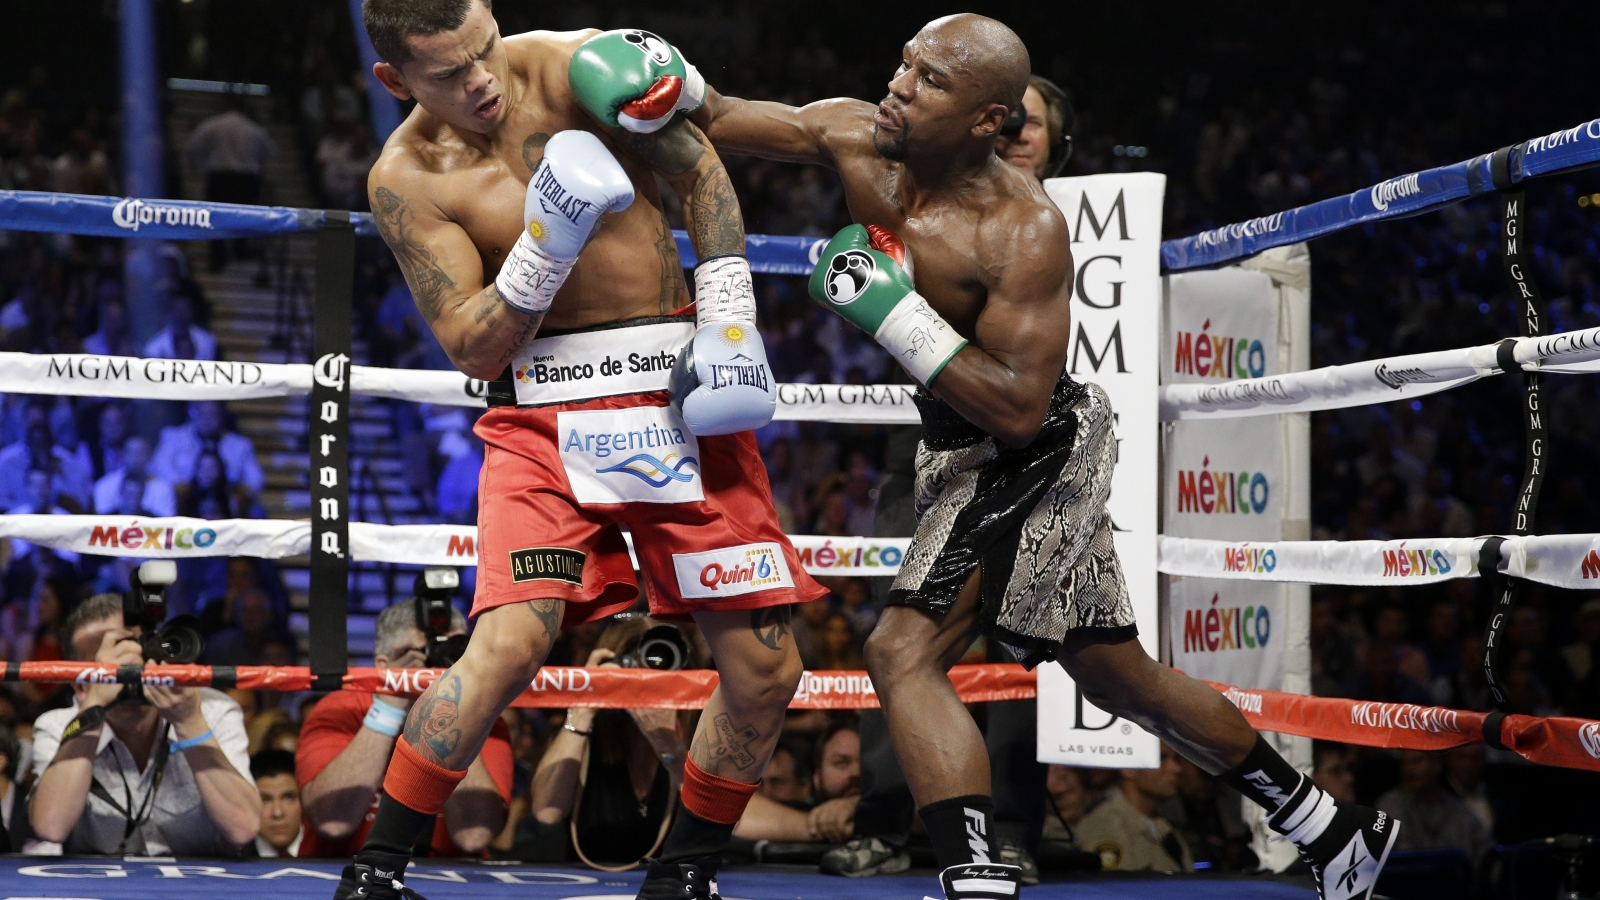 Floyd Mayweather peleando - 1600x900